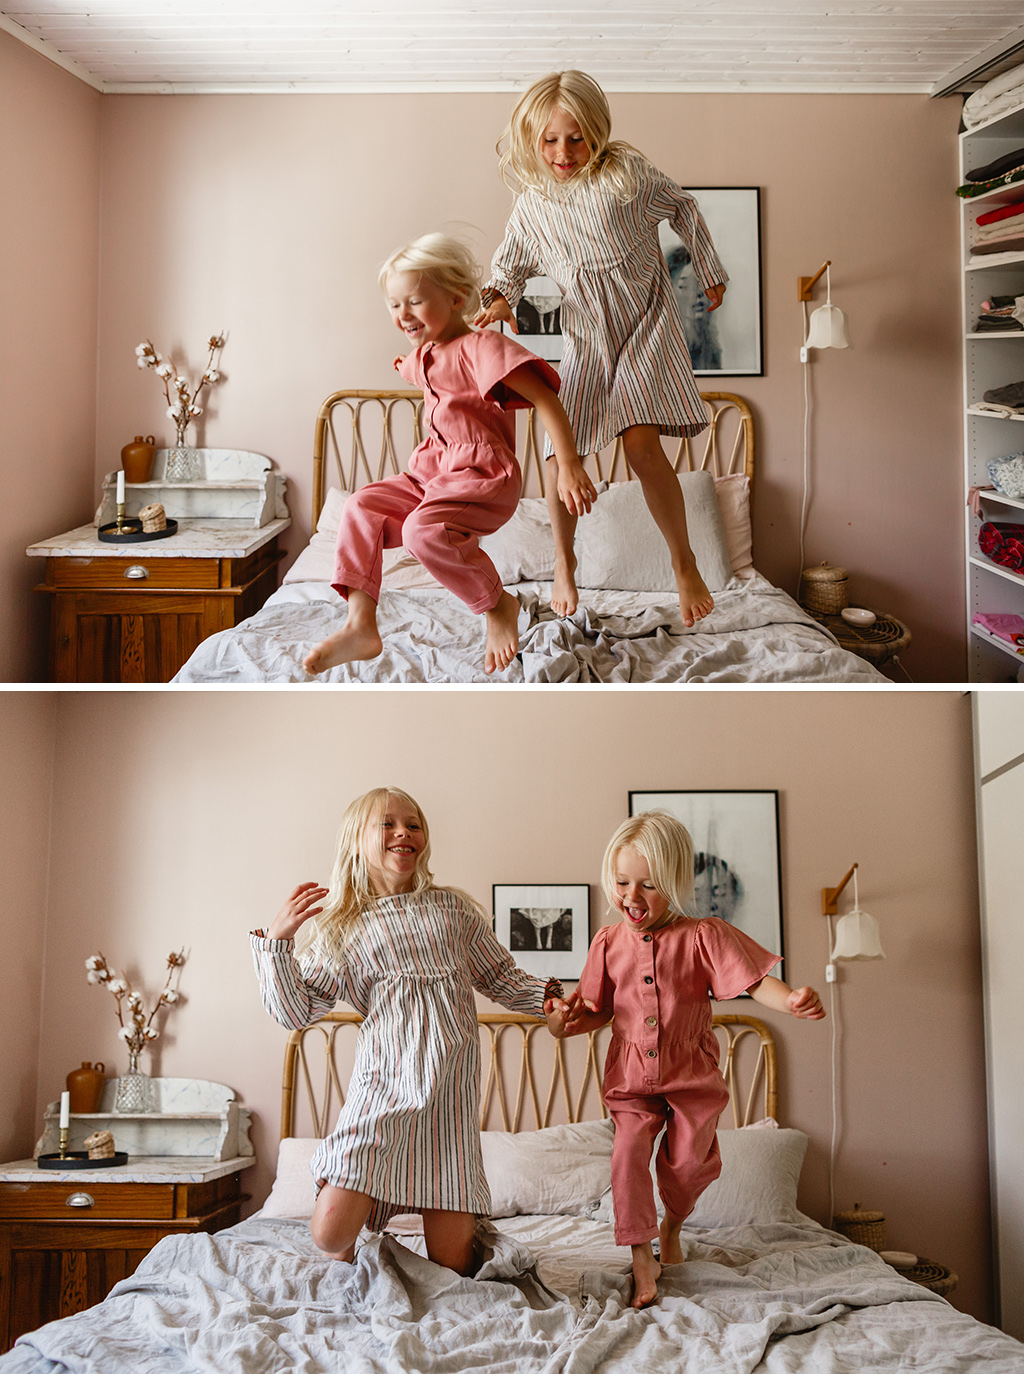 Lifestyle_familjefotografering_Stockholm_hemma-hos-fotografering_lifestyle-inhome-session_13.jpg